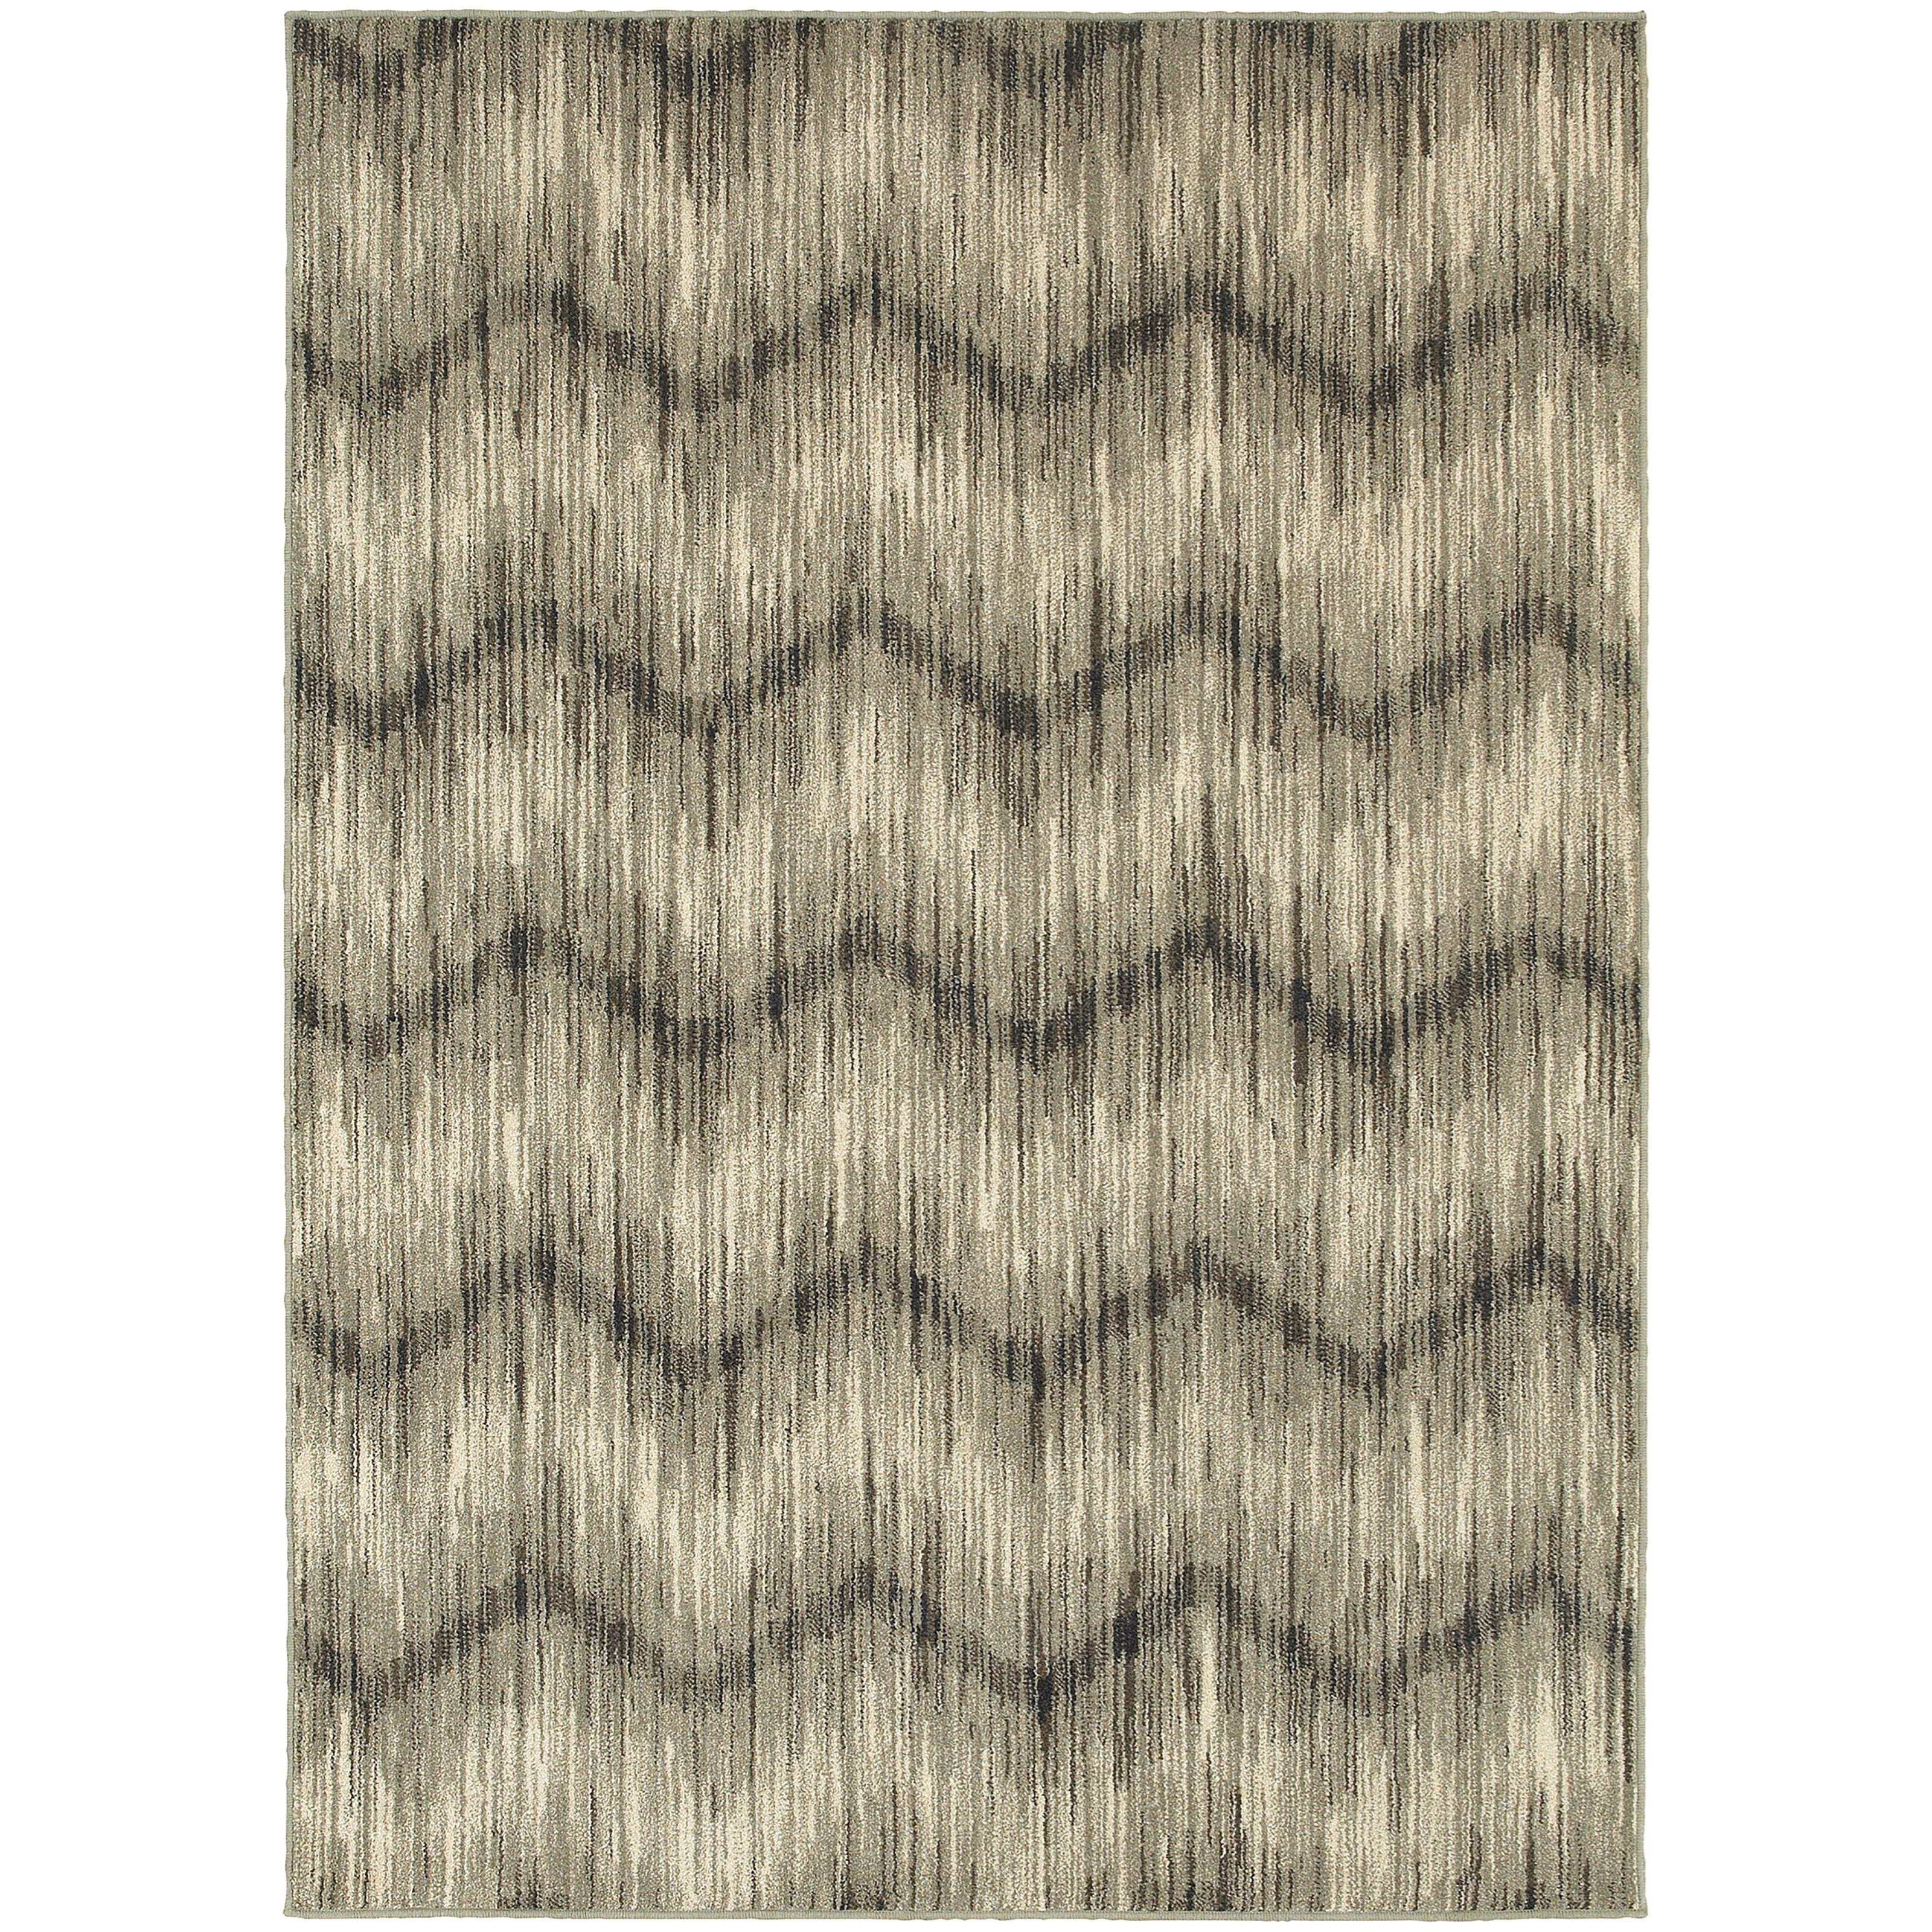 "Oriental Weavers Highlands 6' 7"" X  9' 6"" Rectangle Area Rug - Item Number: HIG6608A67X96"